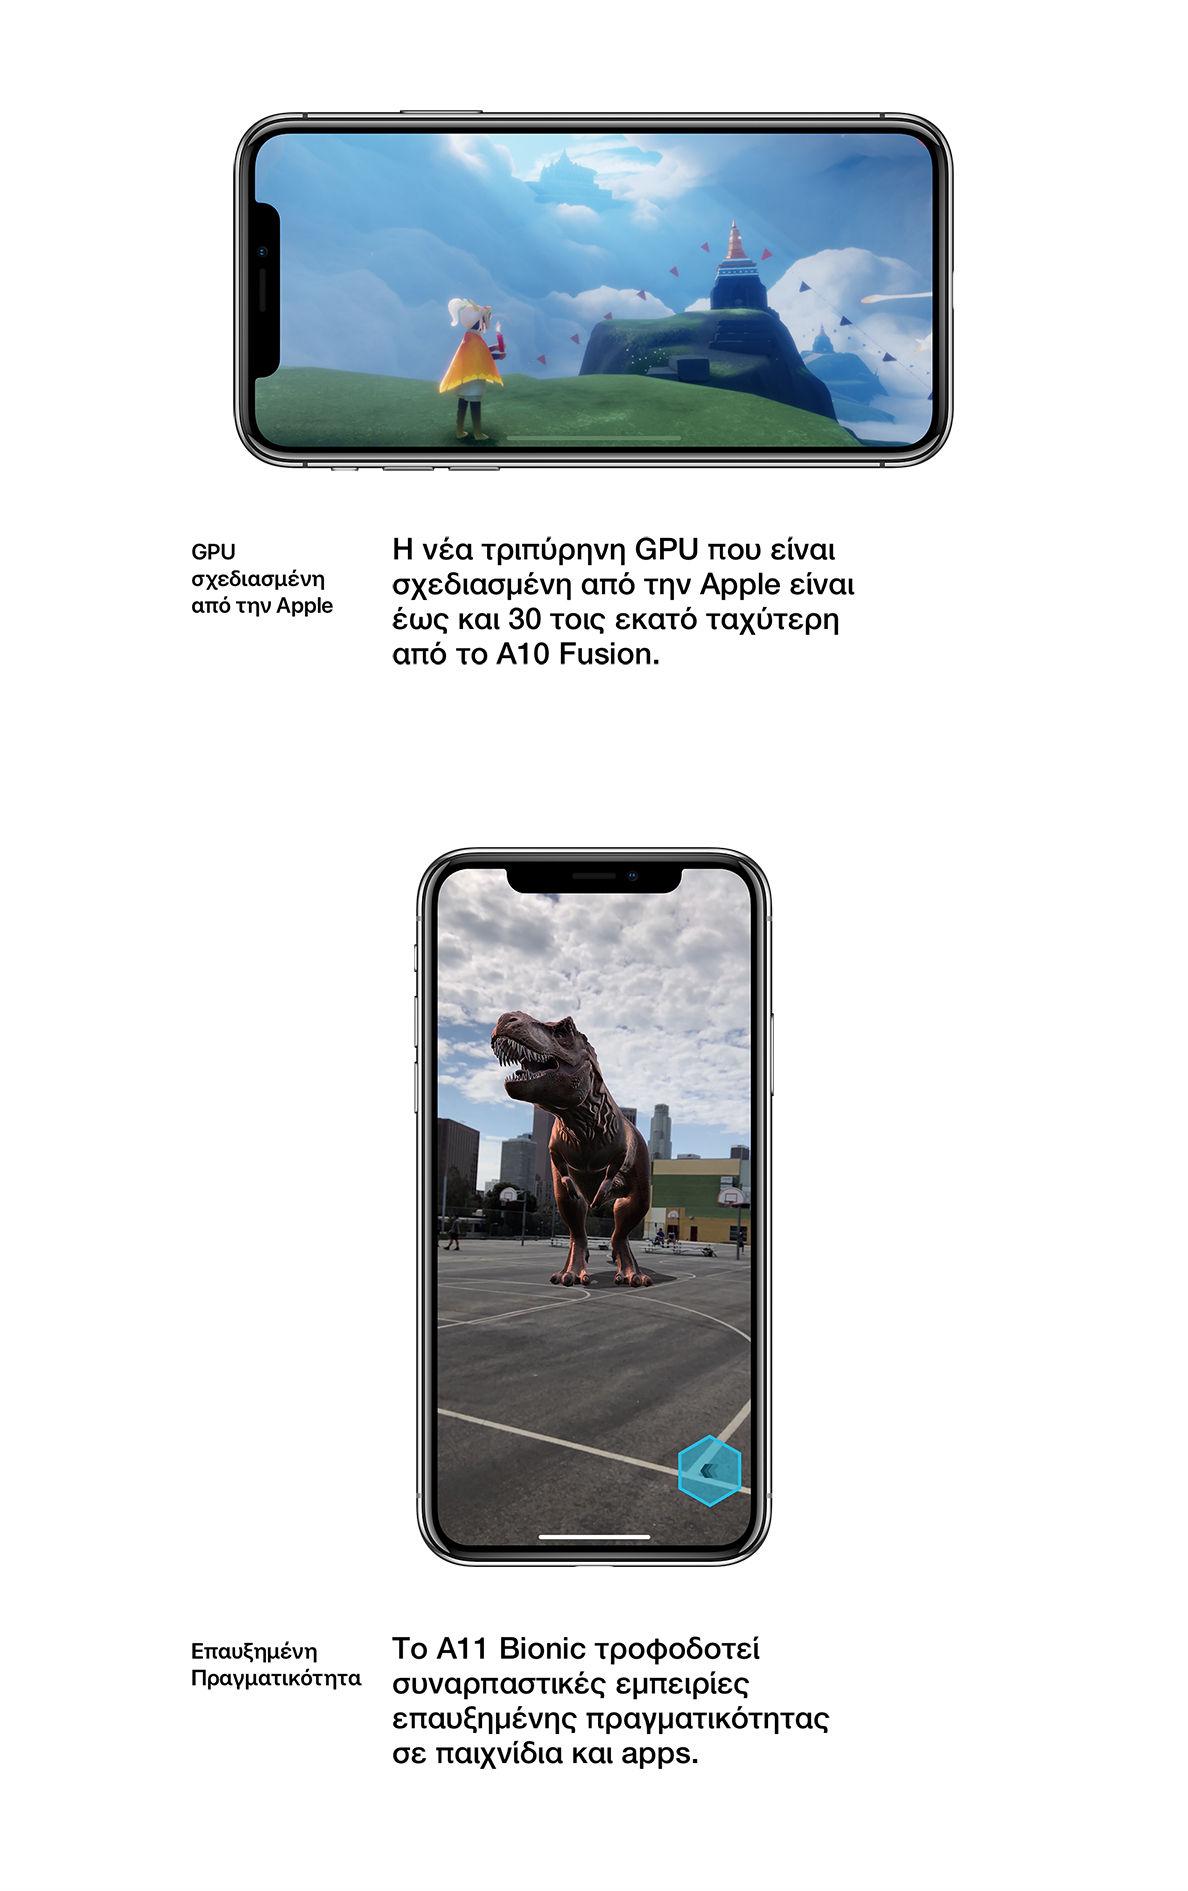 iPhonex-agora-Ellada-Mediamarkt-public-kotsovolos-germanos-iPhoneX-diathesimo-gia-paraggelia-november-2017 (12)